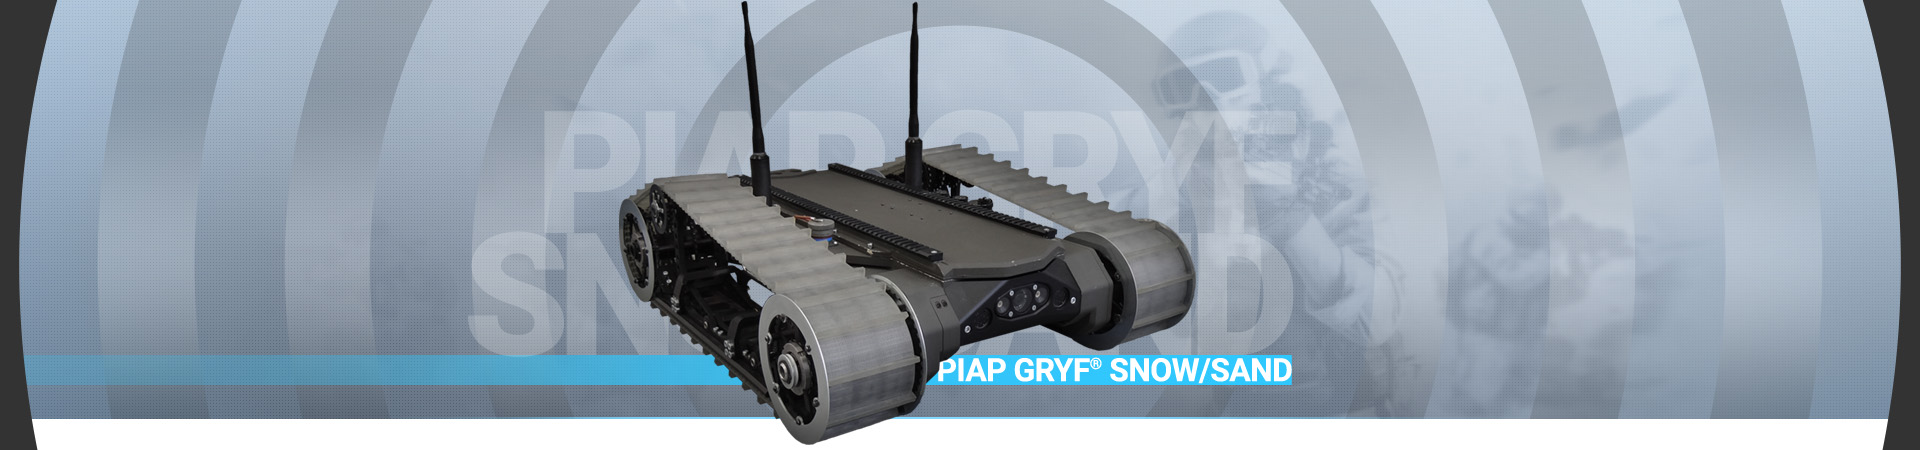 PIAP-GRYF-SNOW-SAND